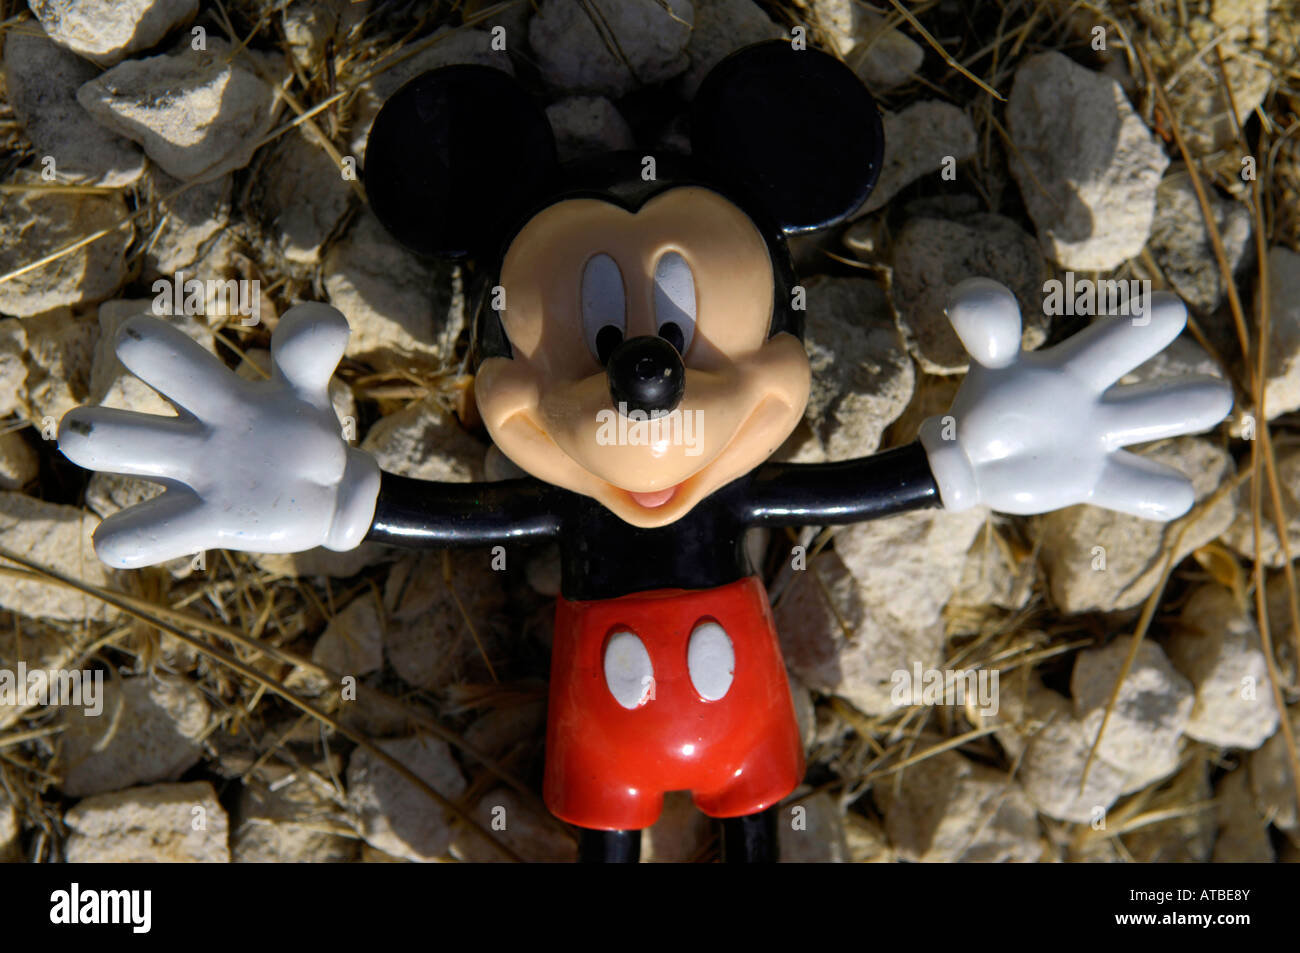 Mickey Mouse Muneco De Goma De Juguete Walt Disney Americana Piso